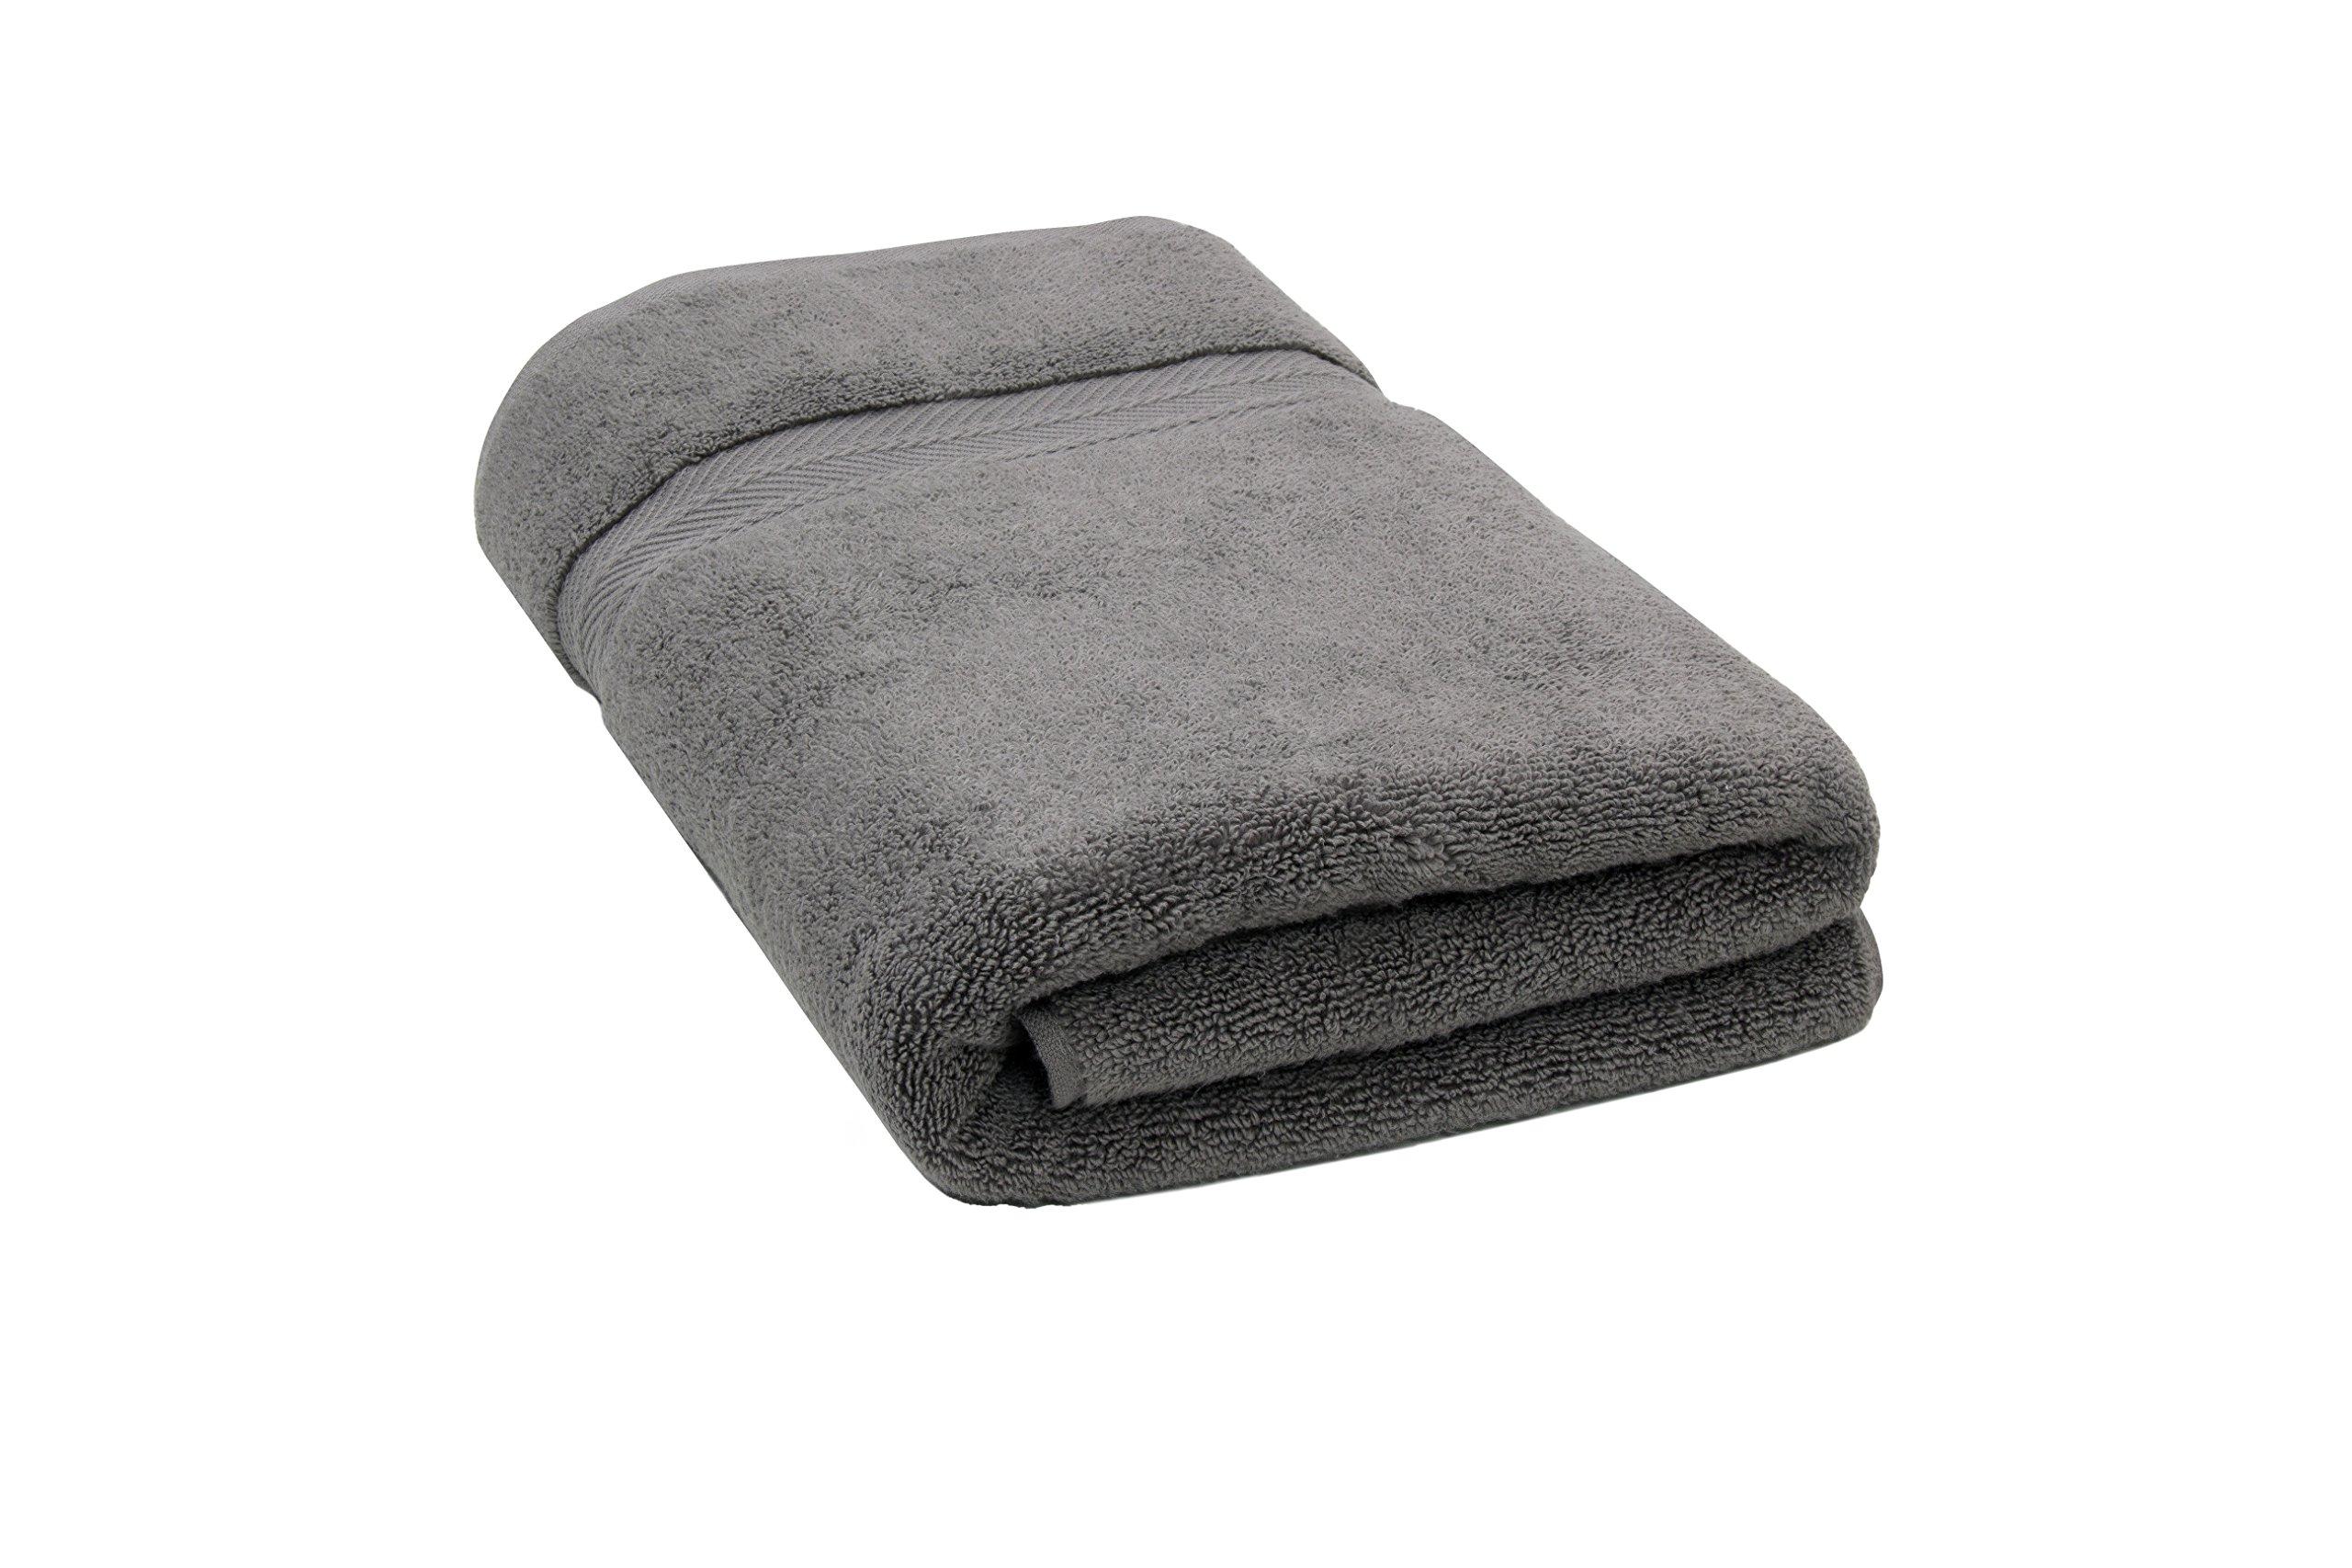 "Bloom Pima Zero Twist Bath Towel - 27"" x 54"" - Premium Ultra Soft, High Absorbency Pima Cotton - Quick Drying Luxury Spa Bath Towels - 600 GSM - Grey"